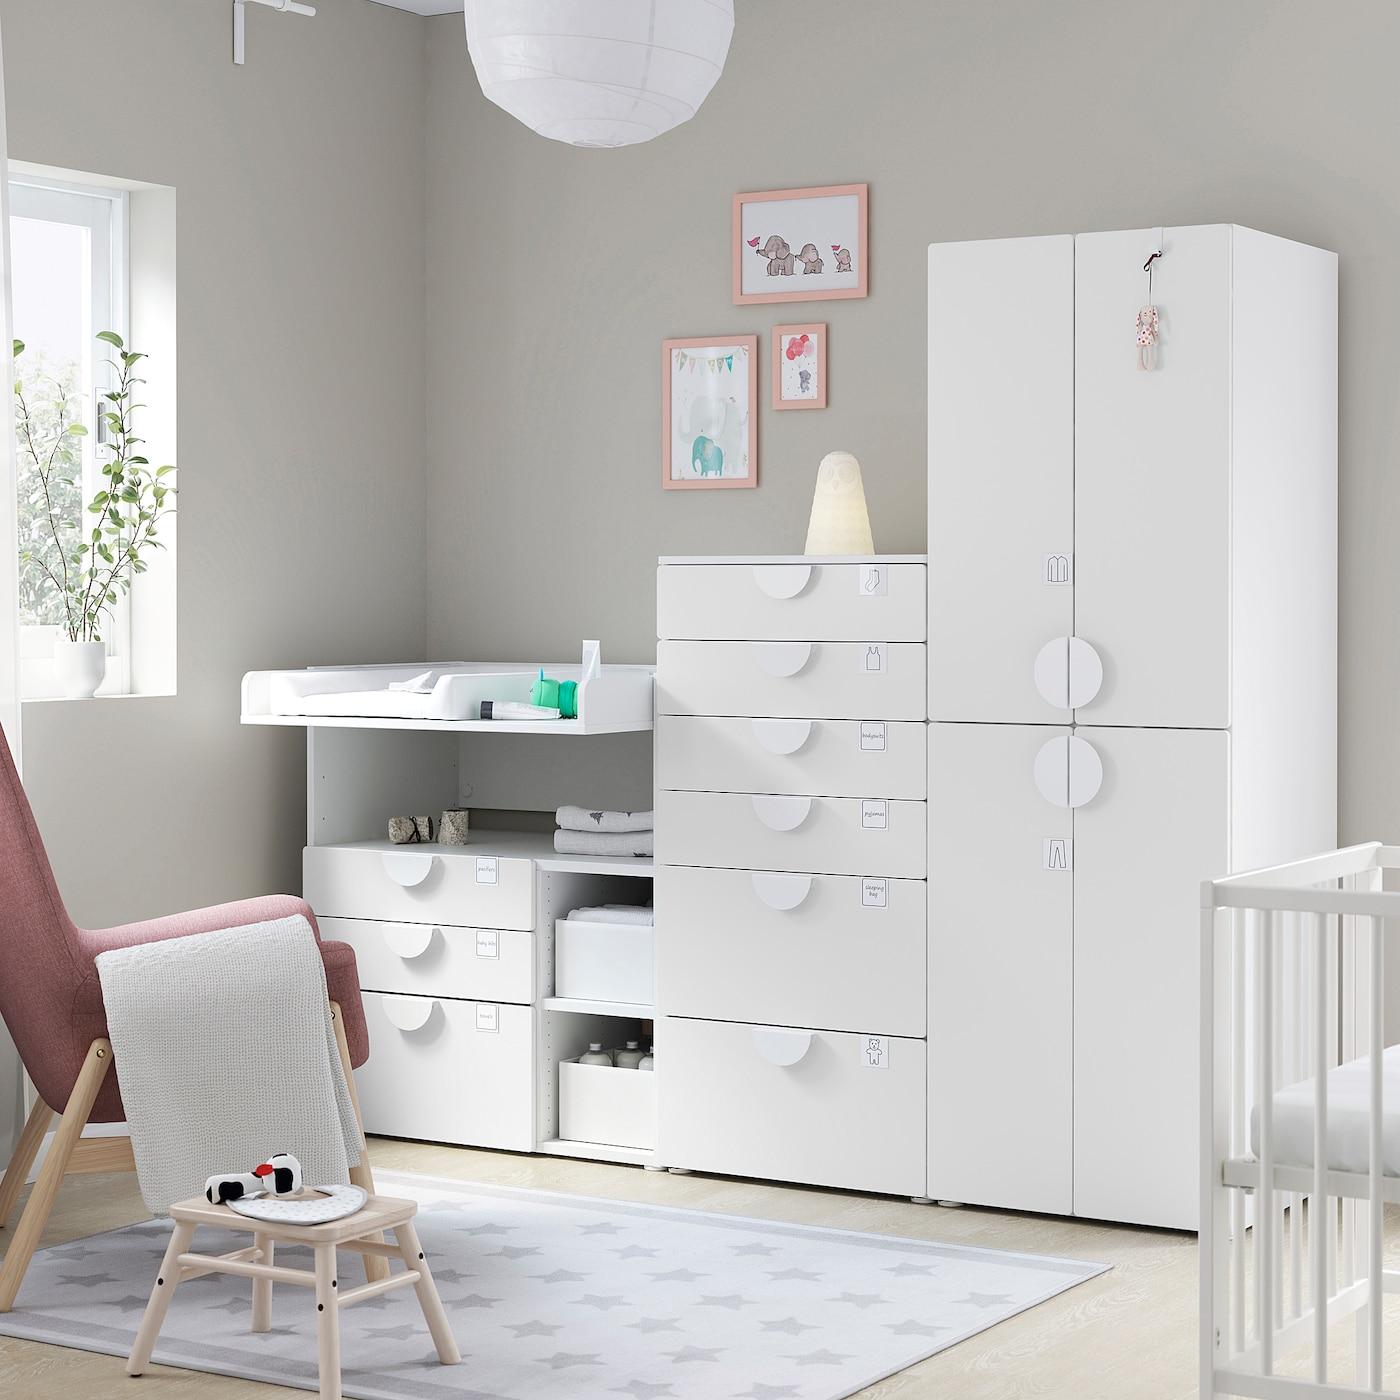 Picture of: Smastad Platsa Opbevaringskombination Hvid Hvid Med Puslebord Ikea